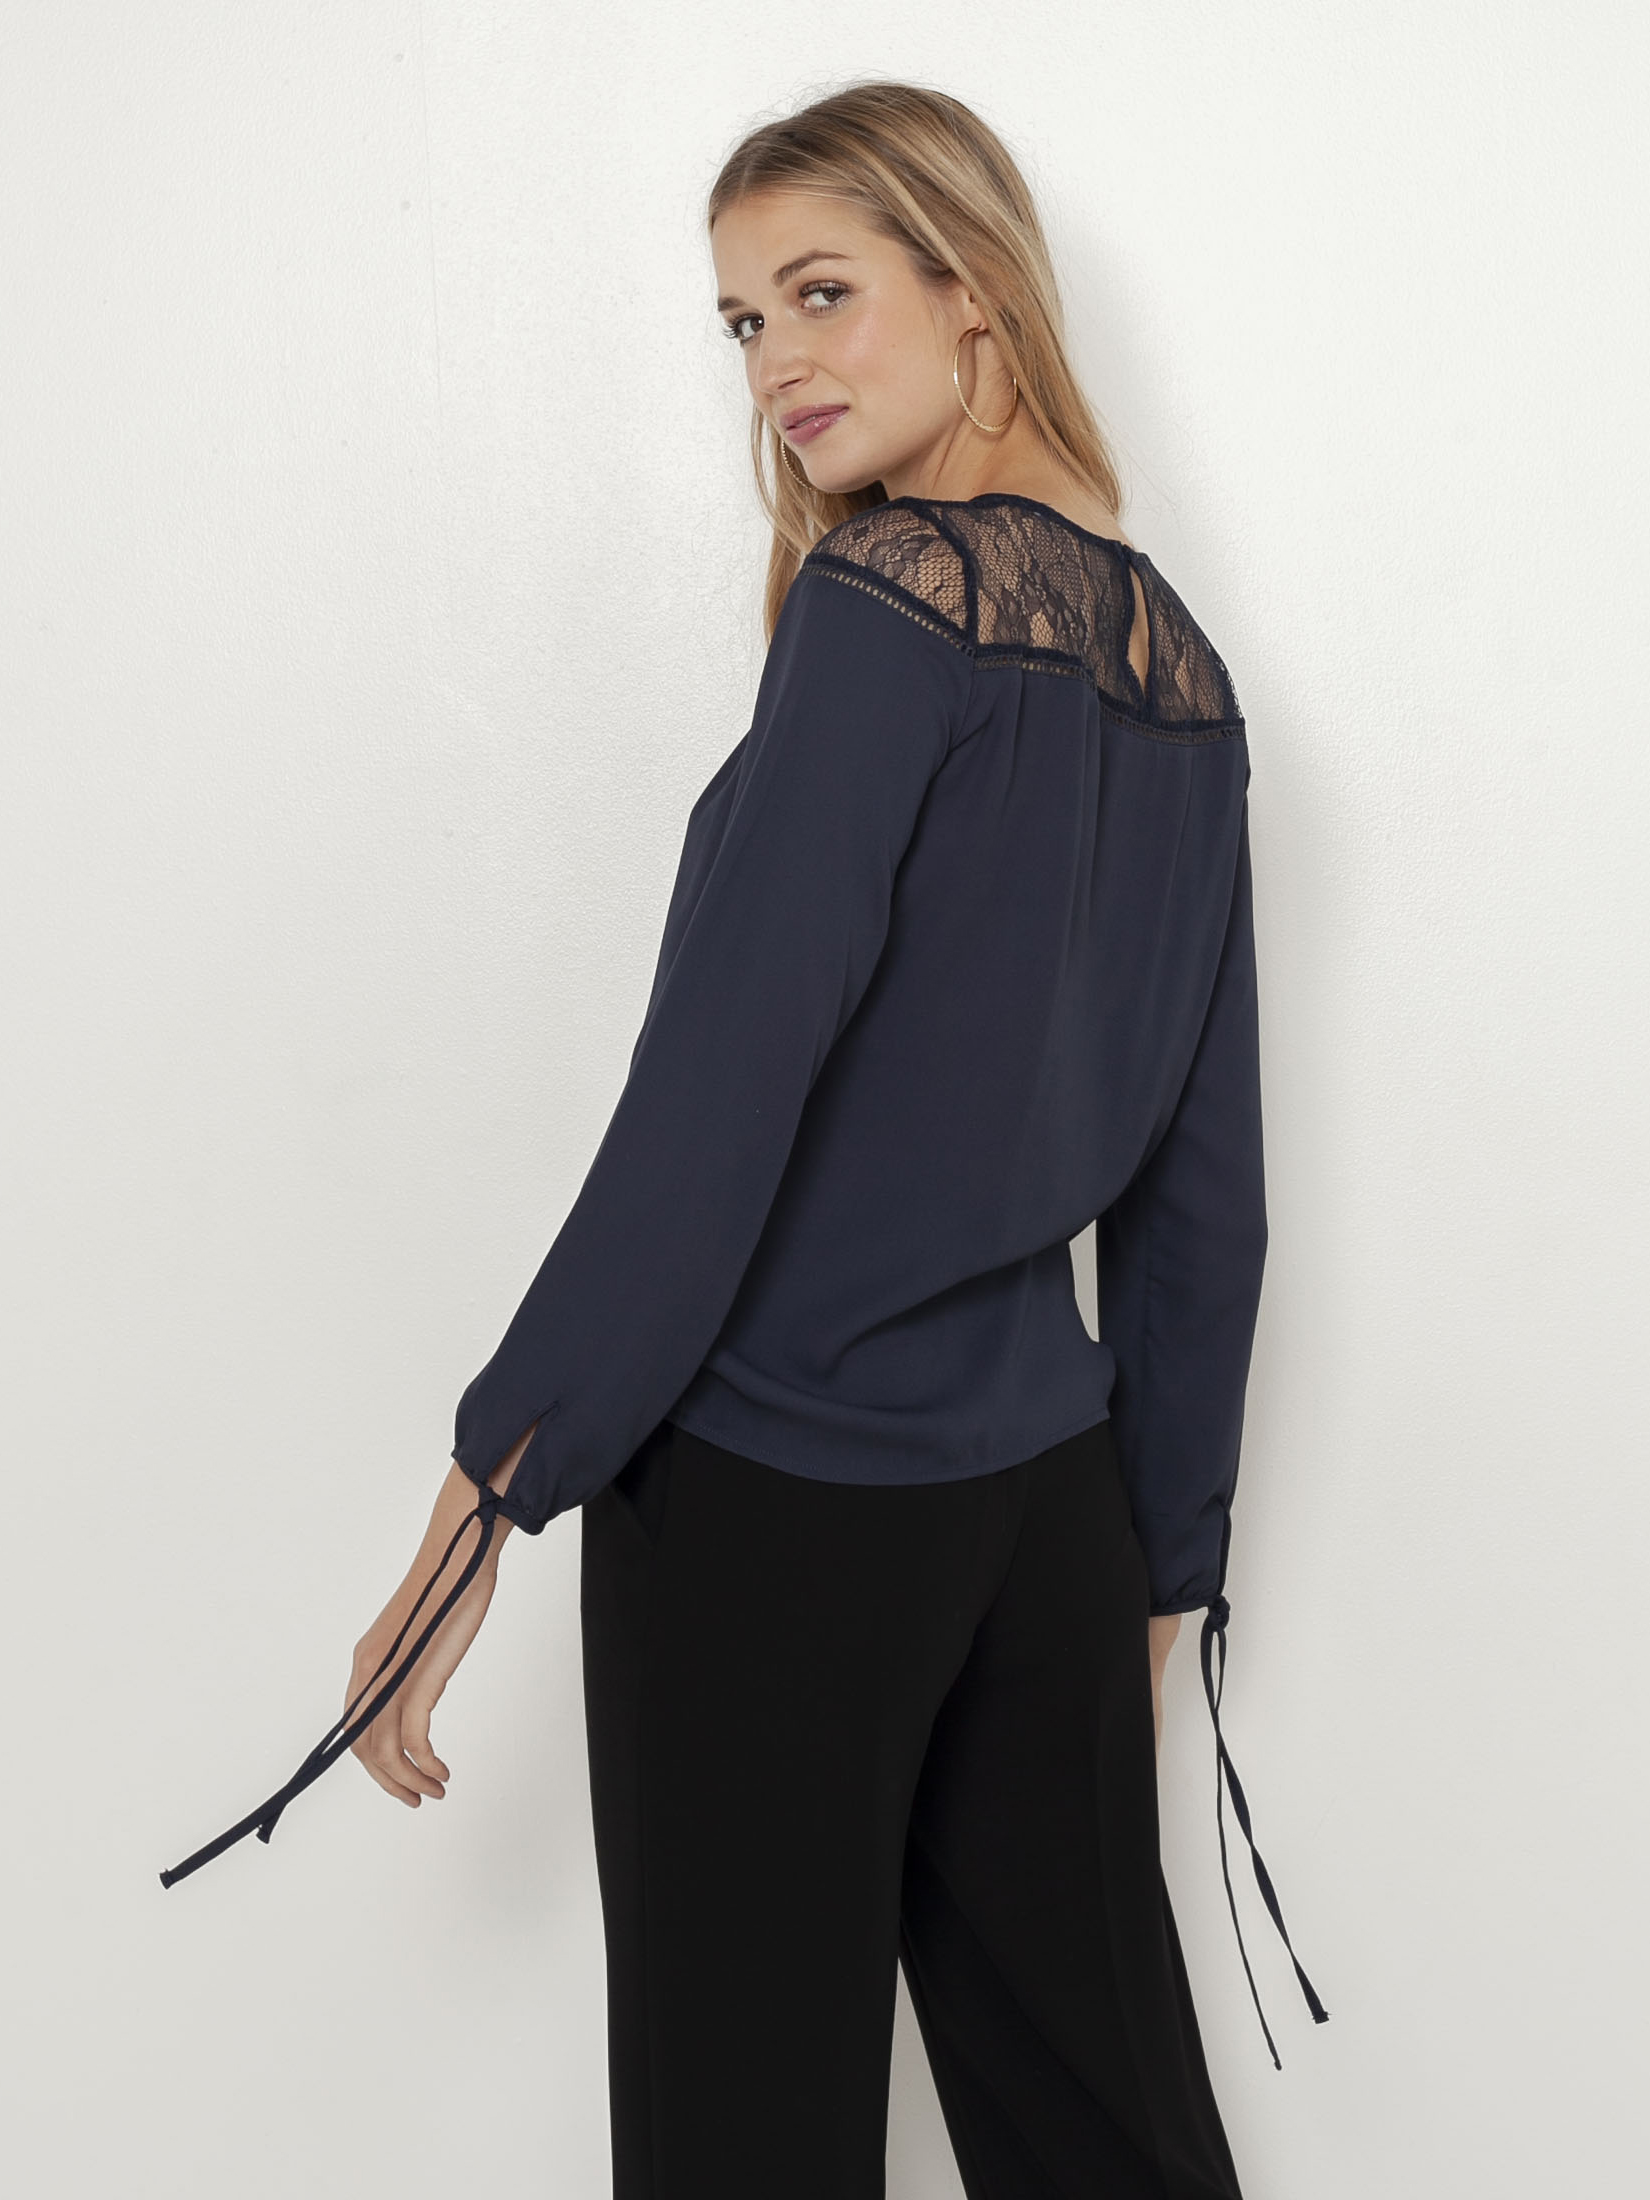 CAMAIEU blue blouse with lace